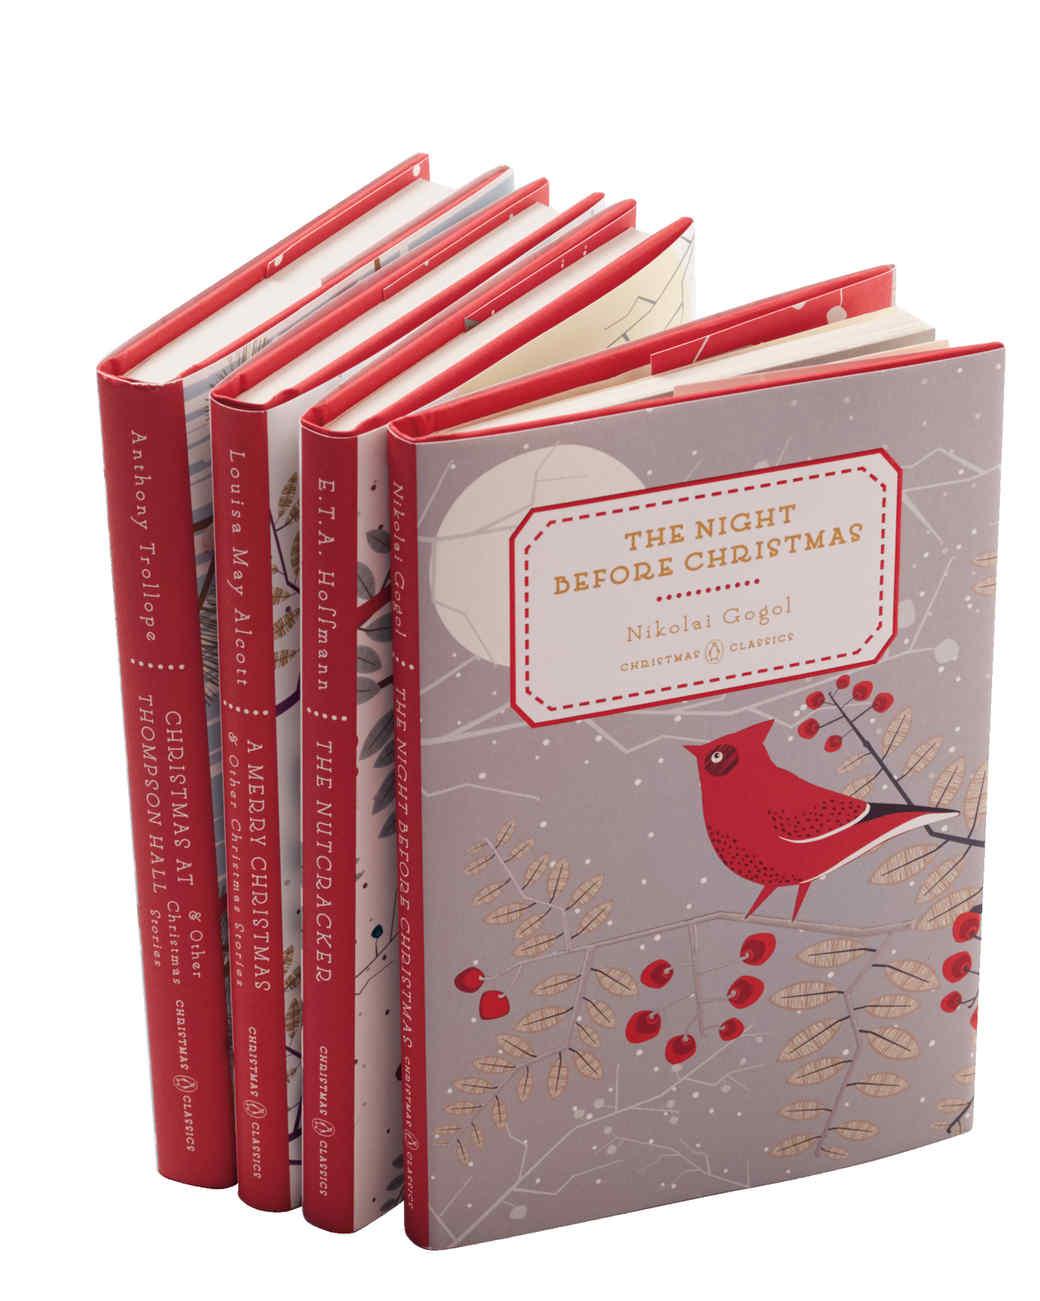 books-186-d112494.jpg